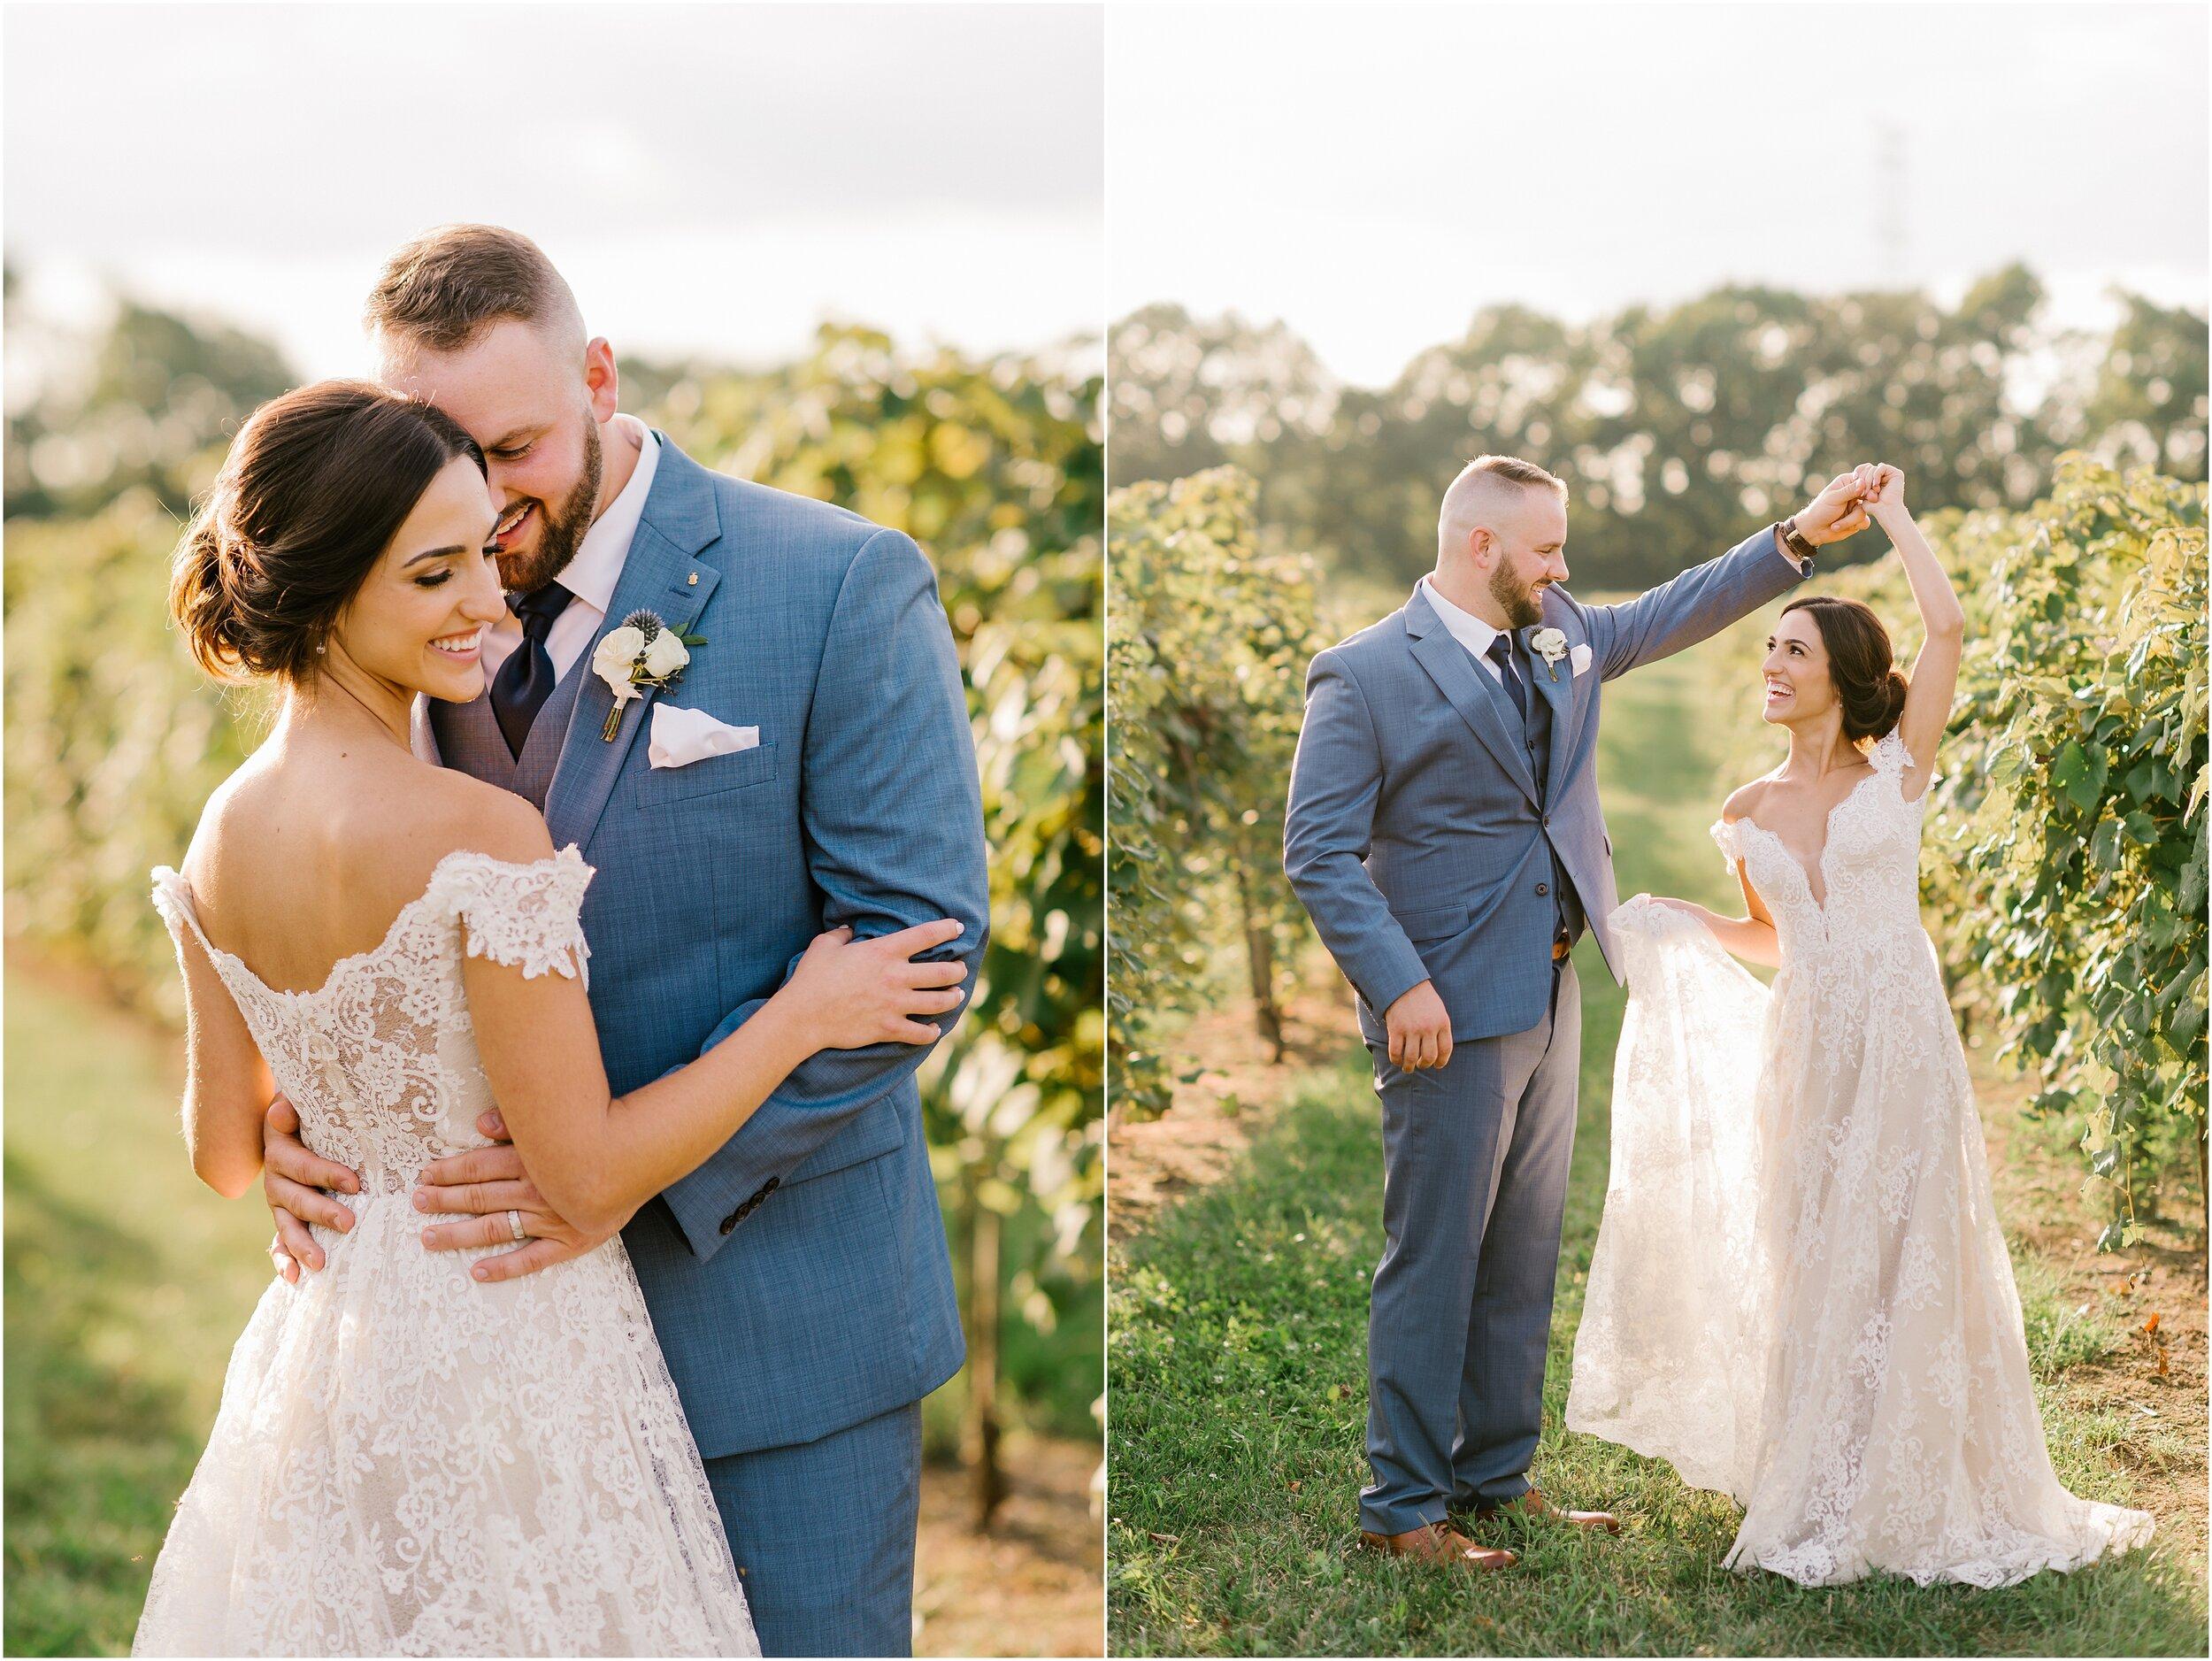 Rebecca Shehorn Photography Indianapolis Wedding Photographer Sycamore at Mallow Run_0768.jpg